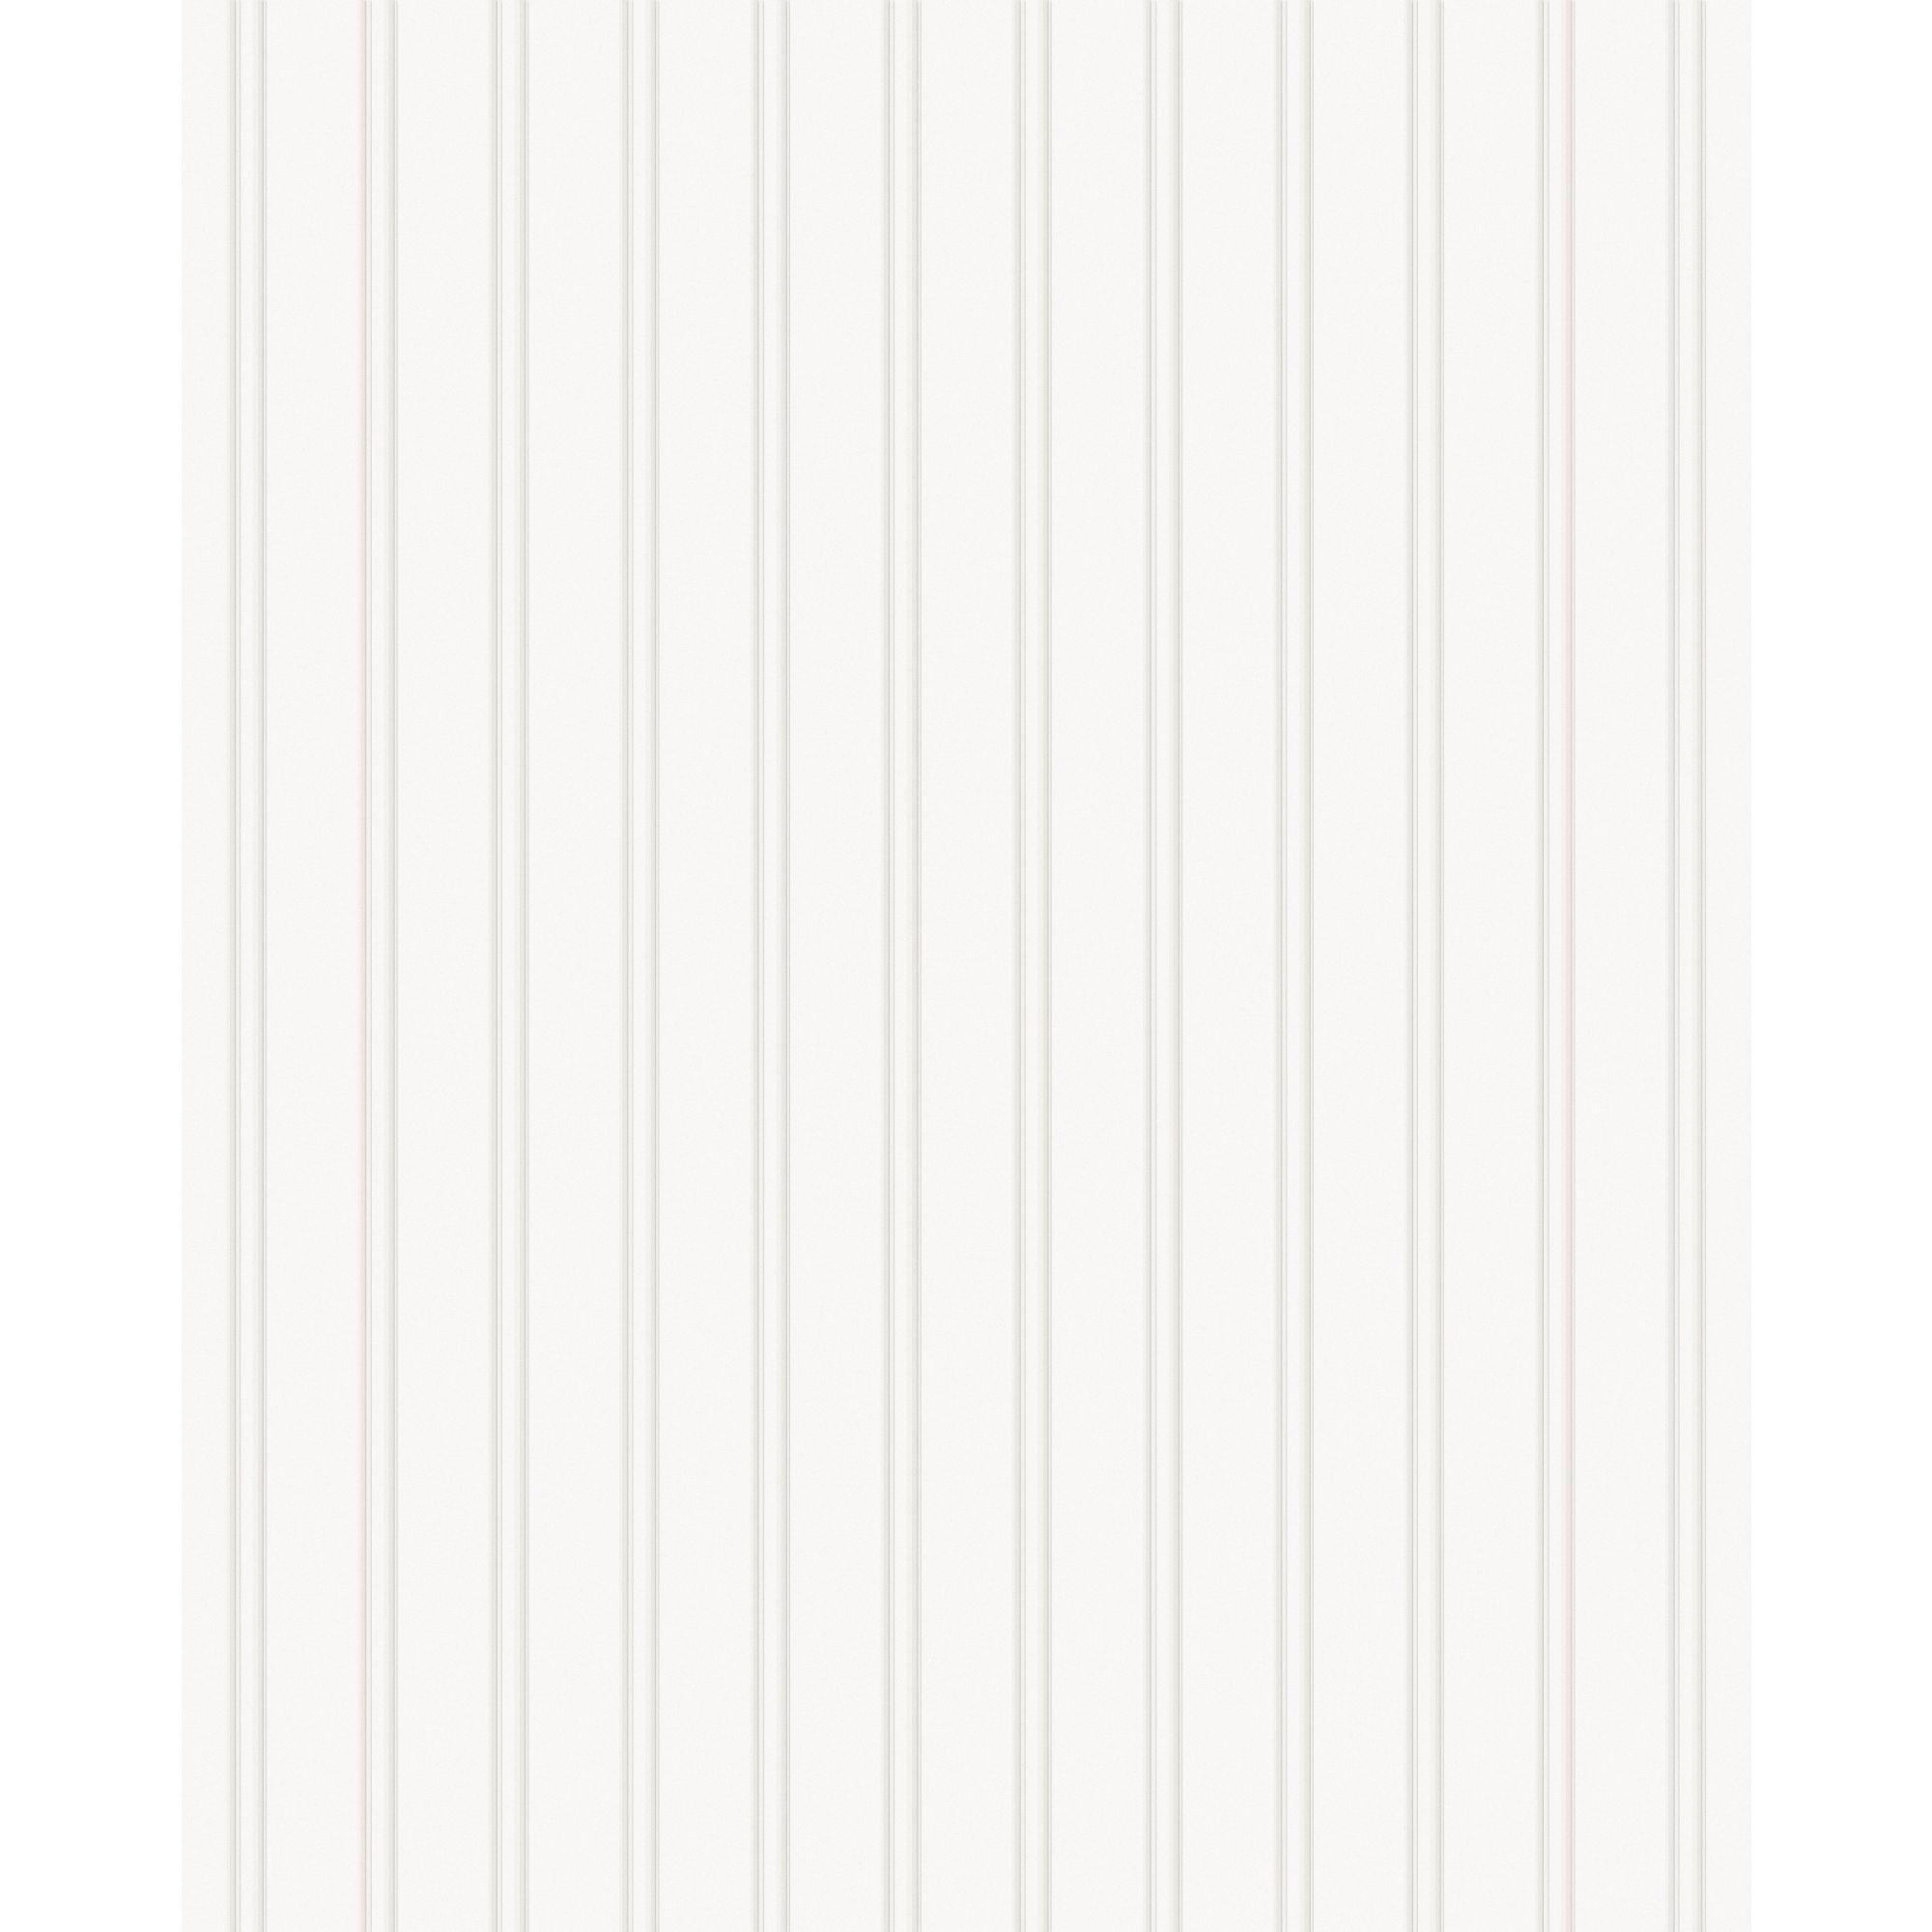 Paintable Prepasted Paintable Beadboard Wallpaper in White   15274 2000x2000